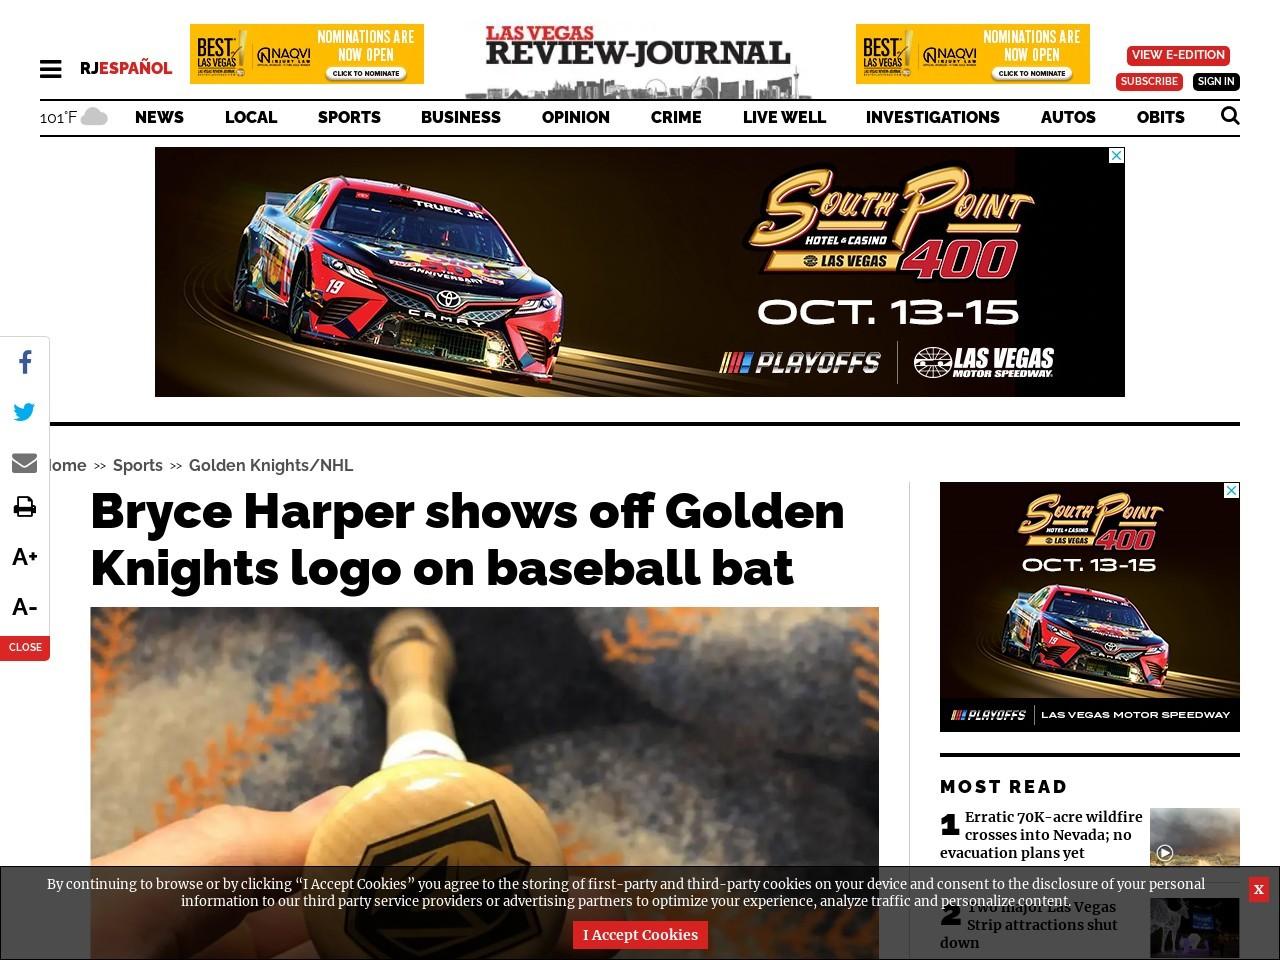 Bryce Harper shows off Golden Knights logo on baseball bat